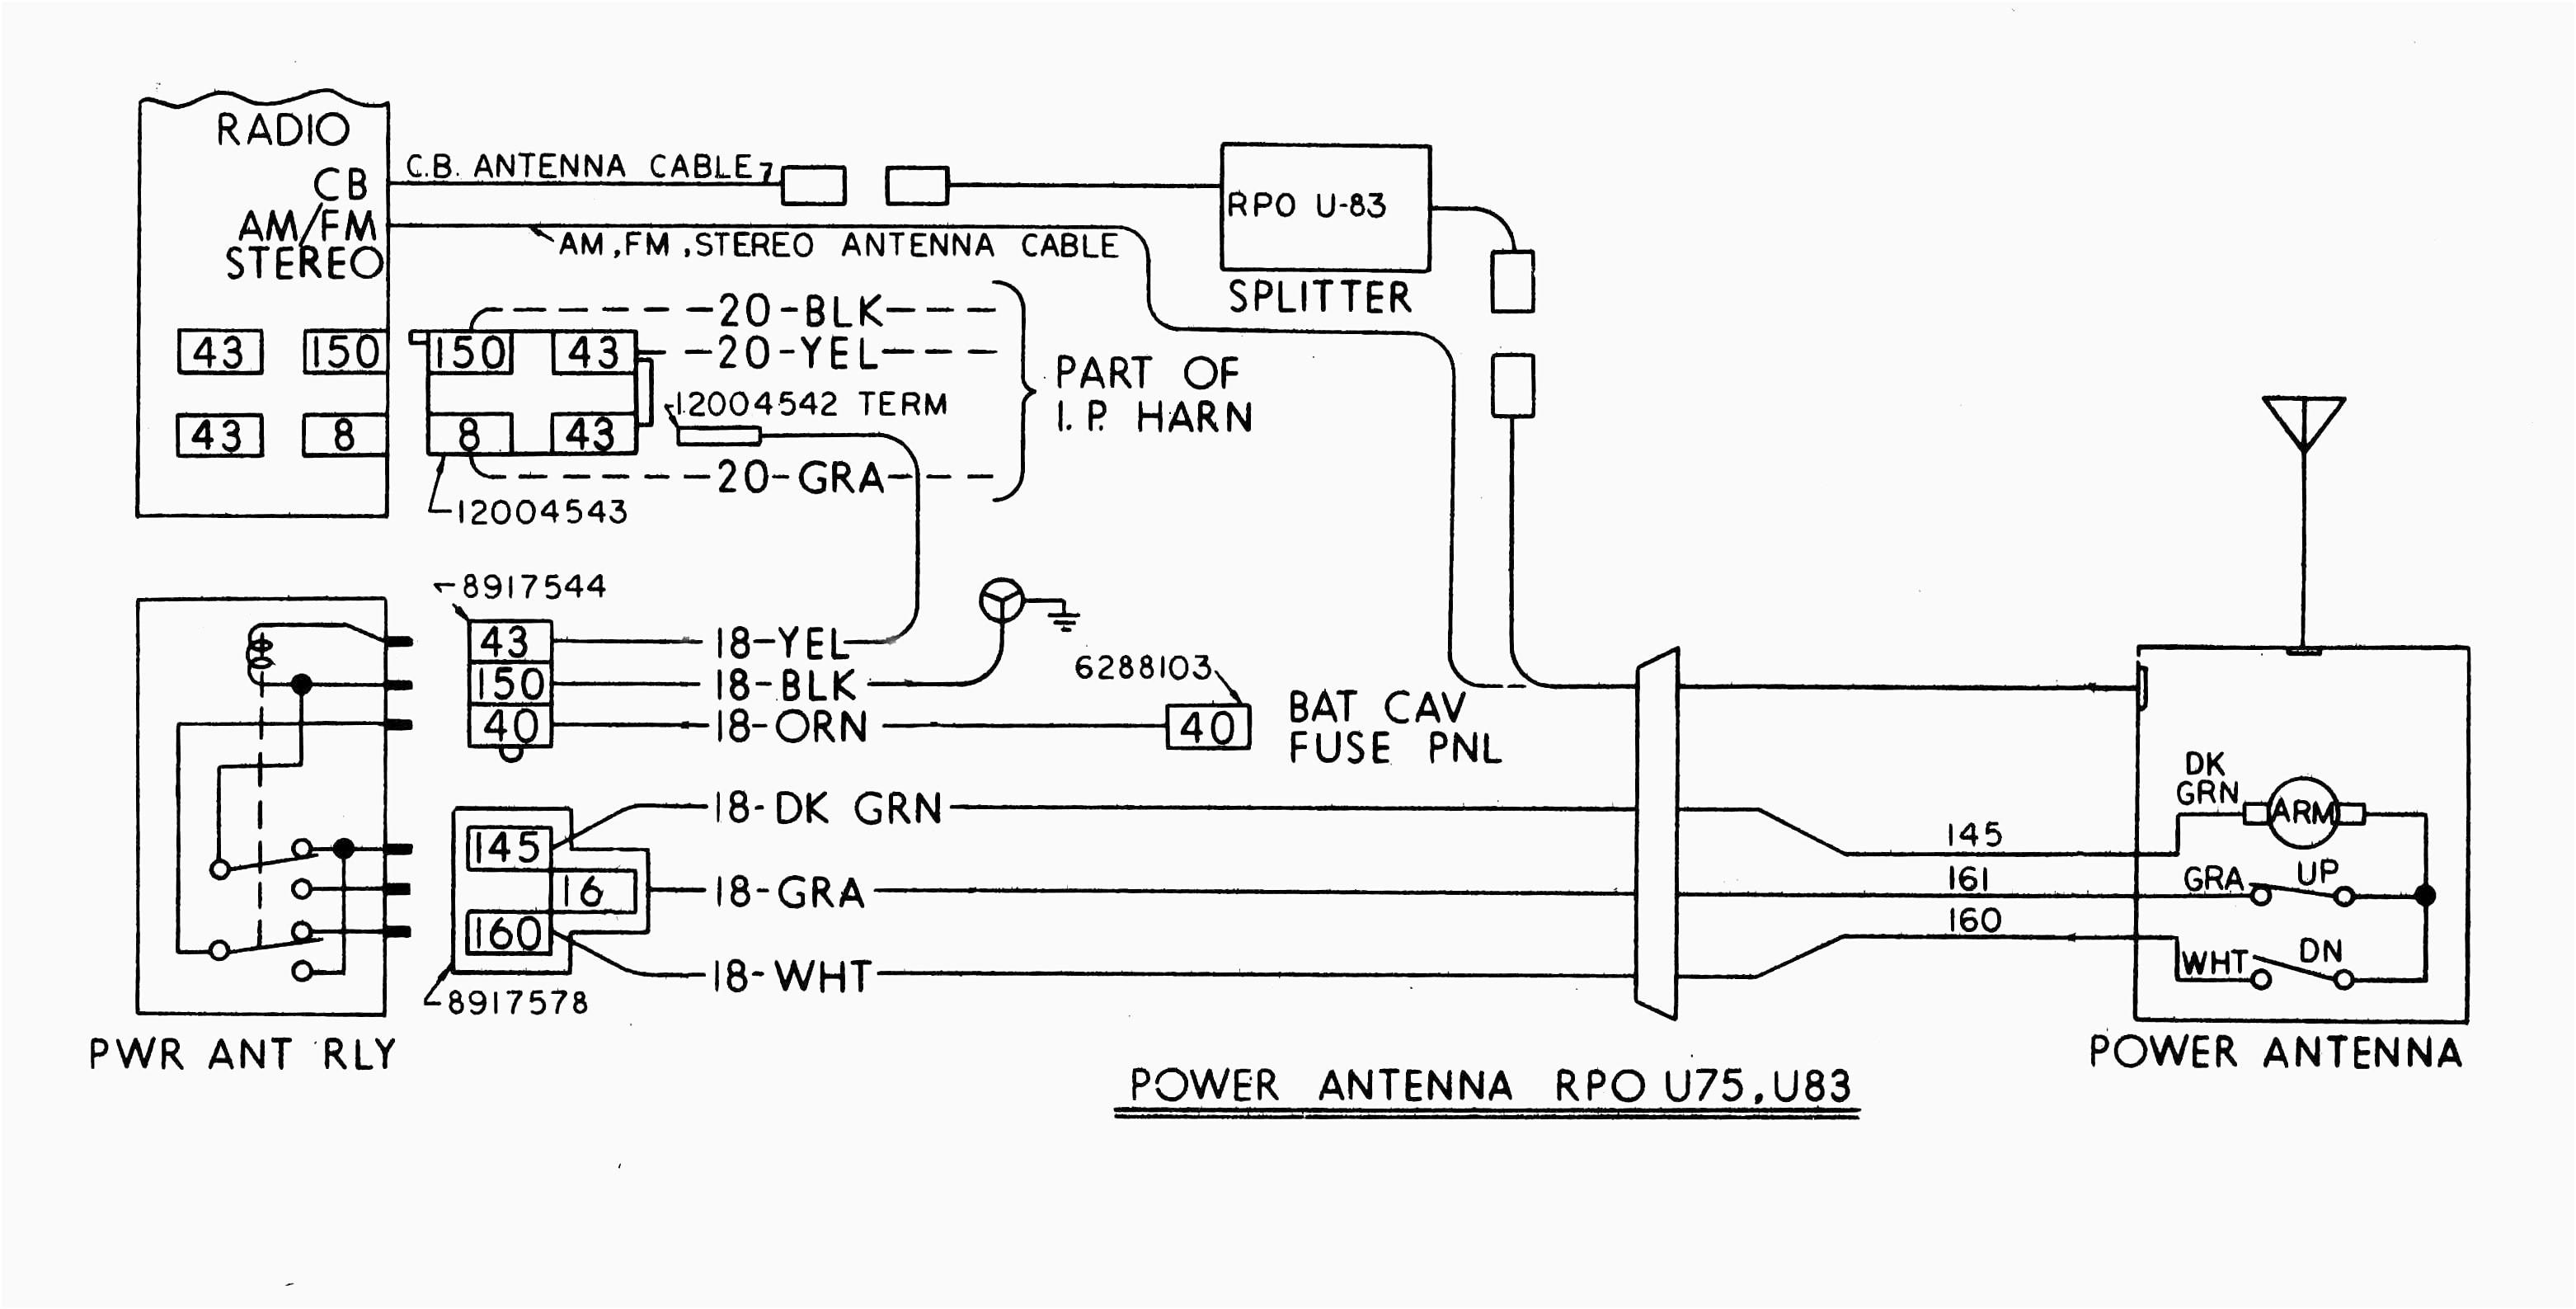 Power Antenna Wiring Diagram Image Tv Car Dodge Caliber Fuse Unusual